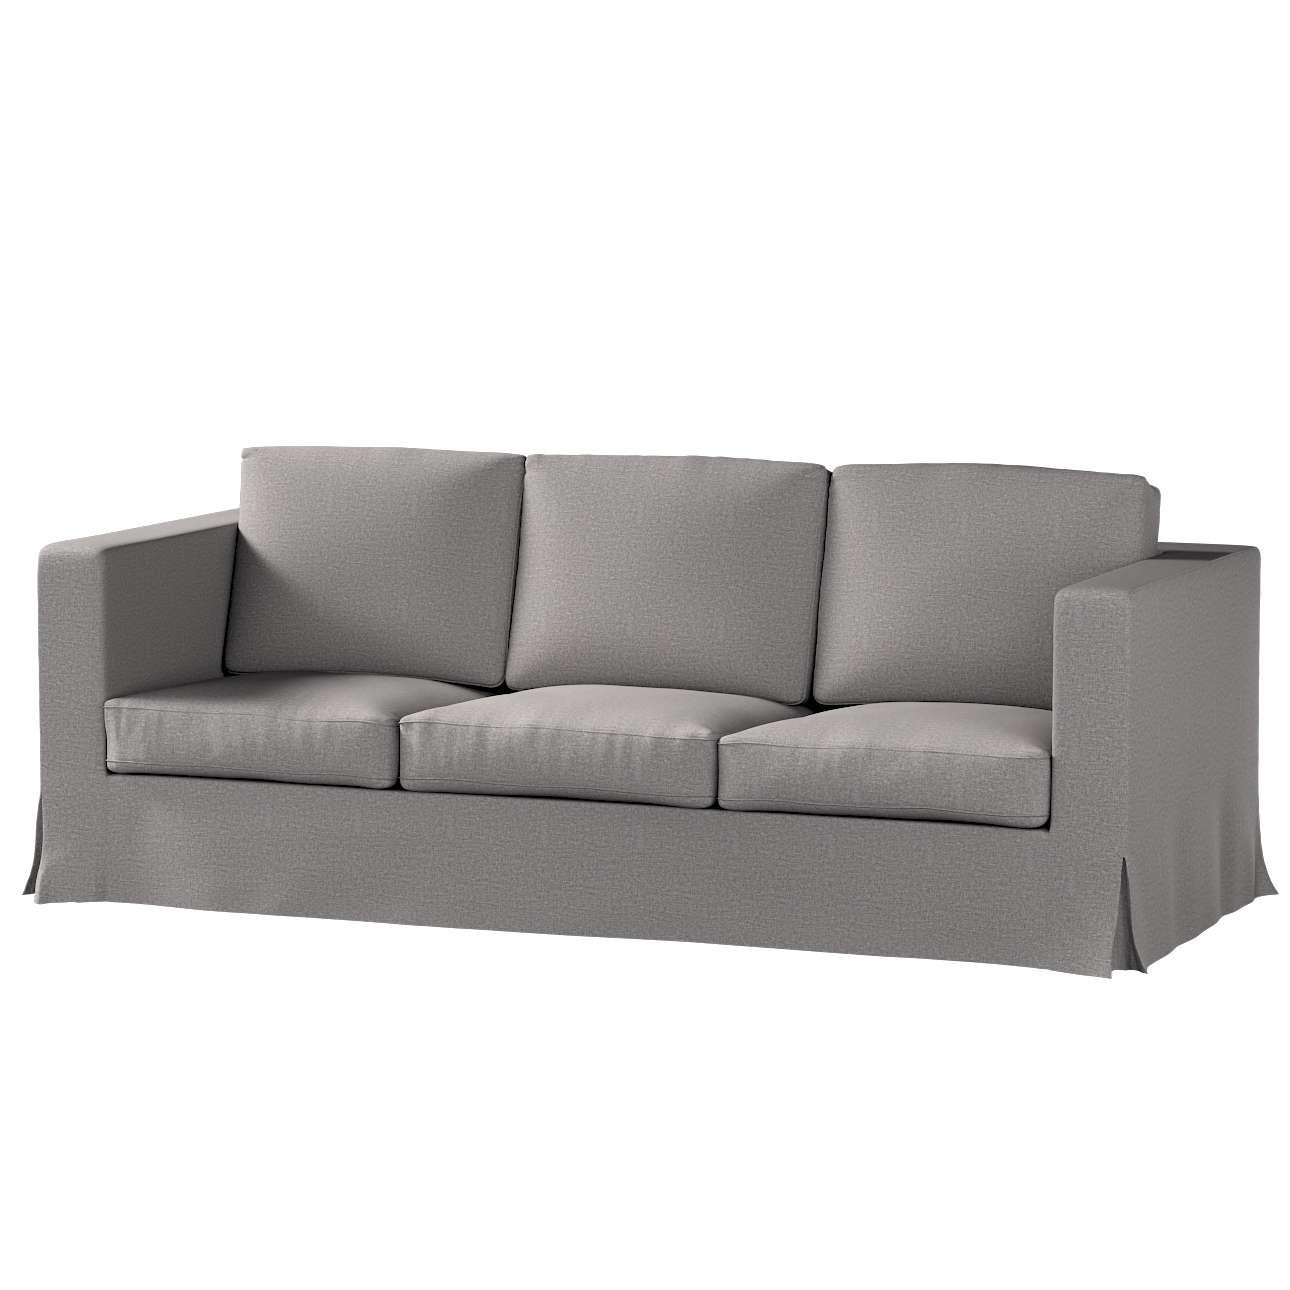 Karlanda 3-Sitzer Sofabezug nicht ausklappbar lang Sofa Karlanda 3-lang von der Kollektion Edinburgh , Stoff: 115-81